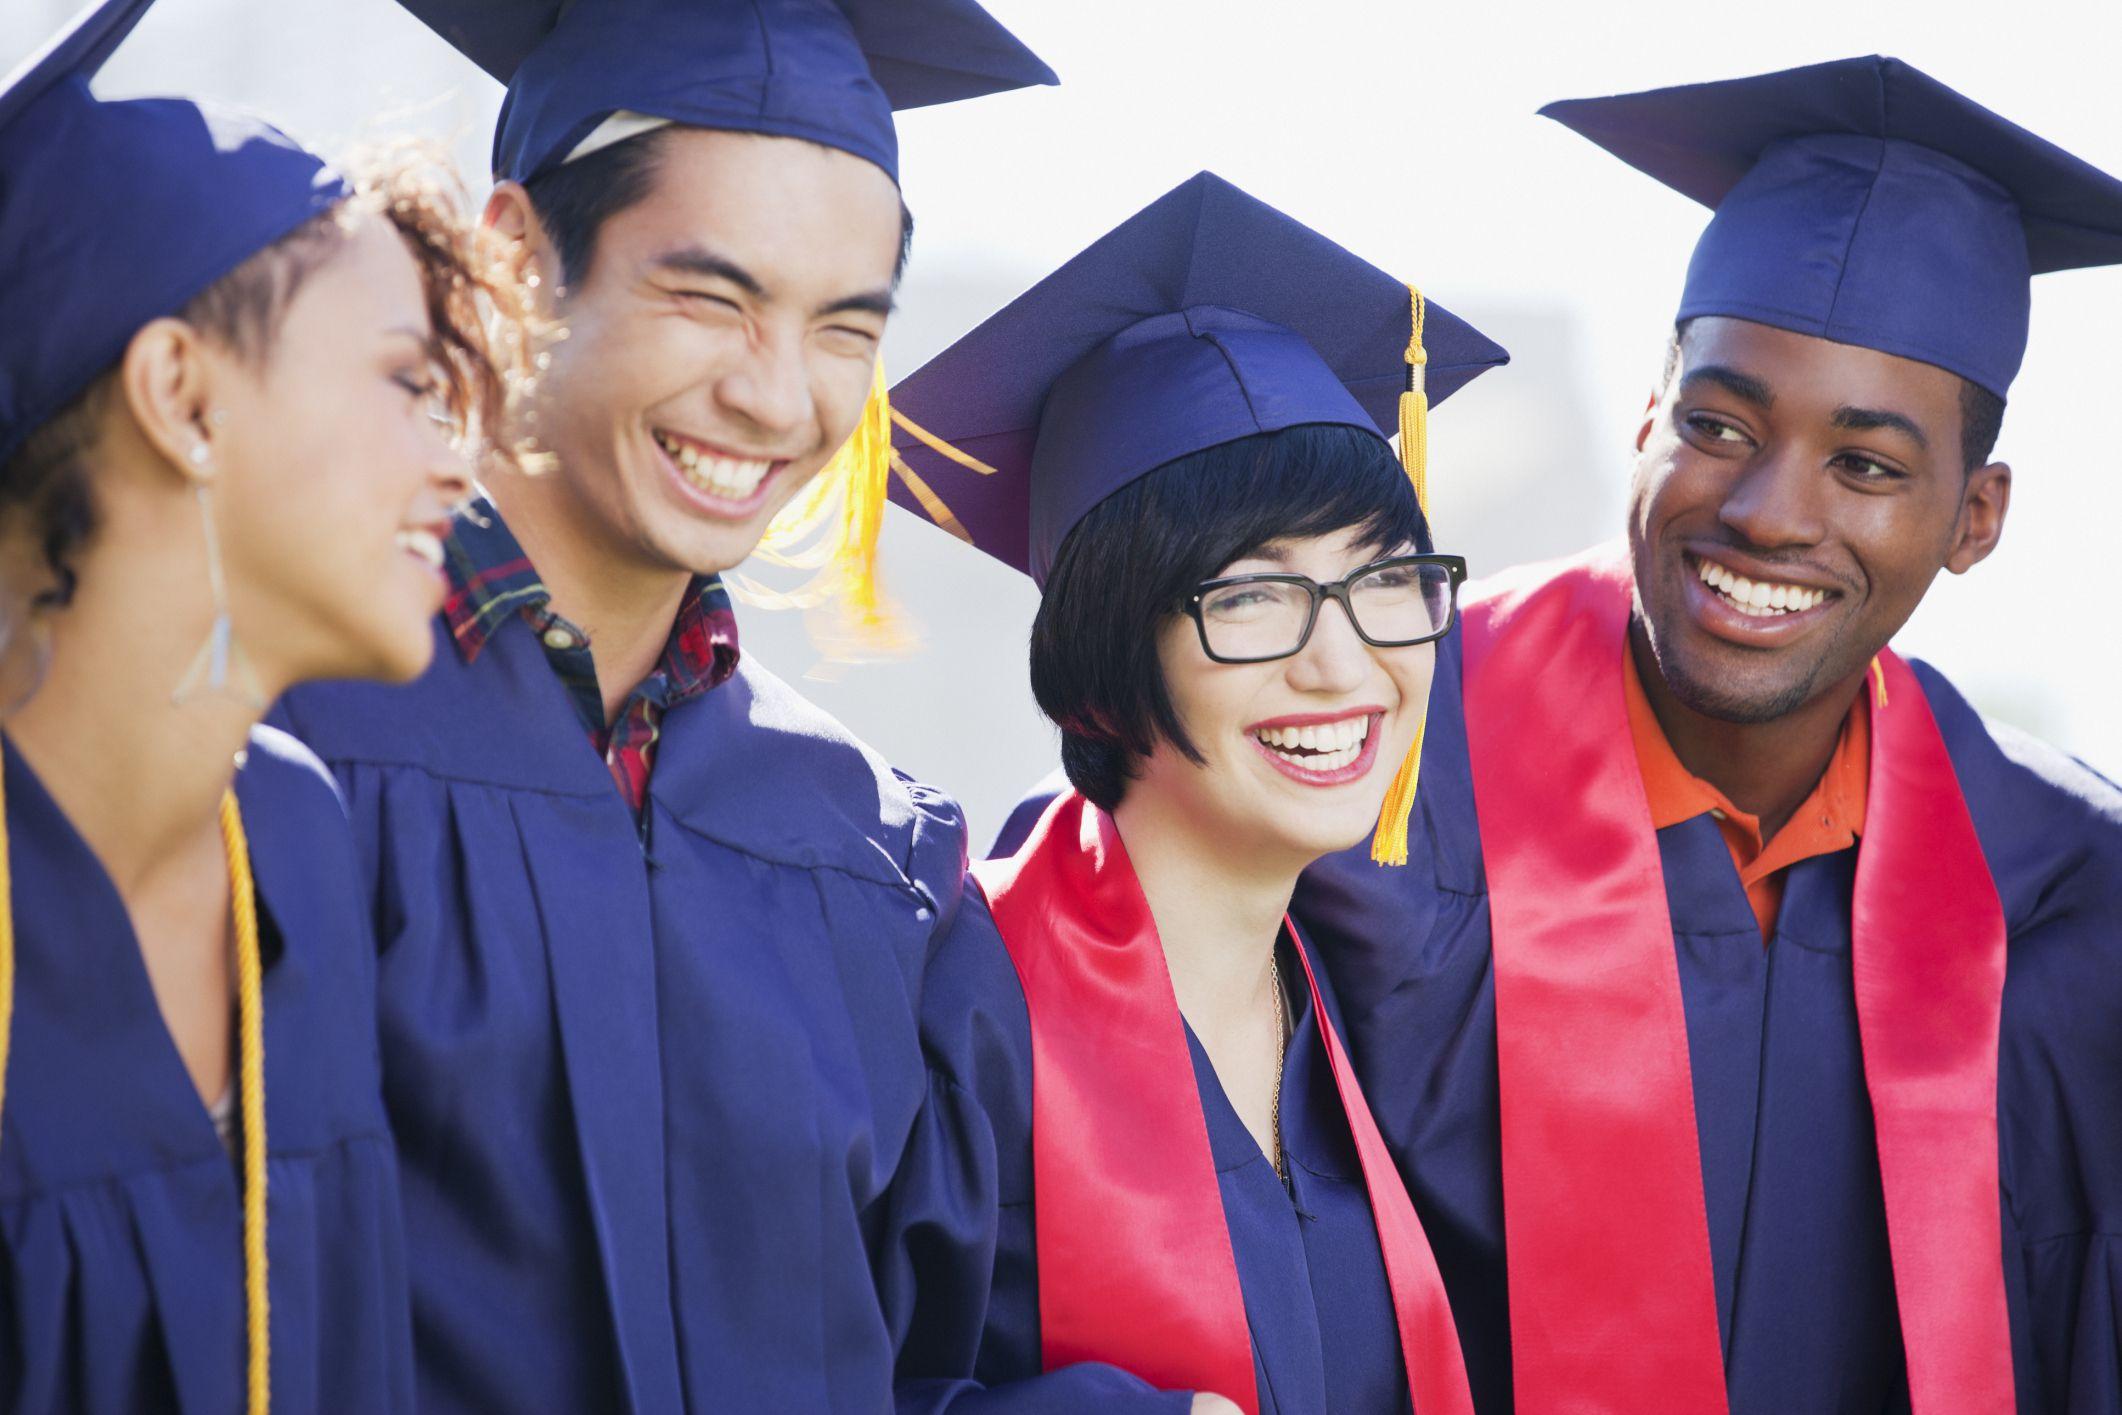 The Top Skills Employers Seek In College Grads